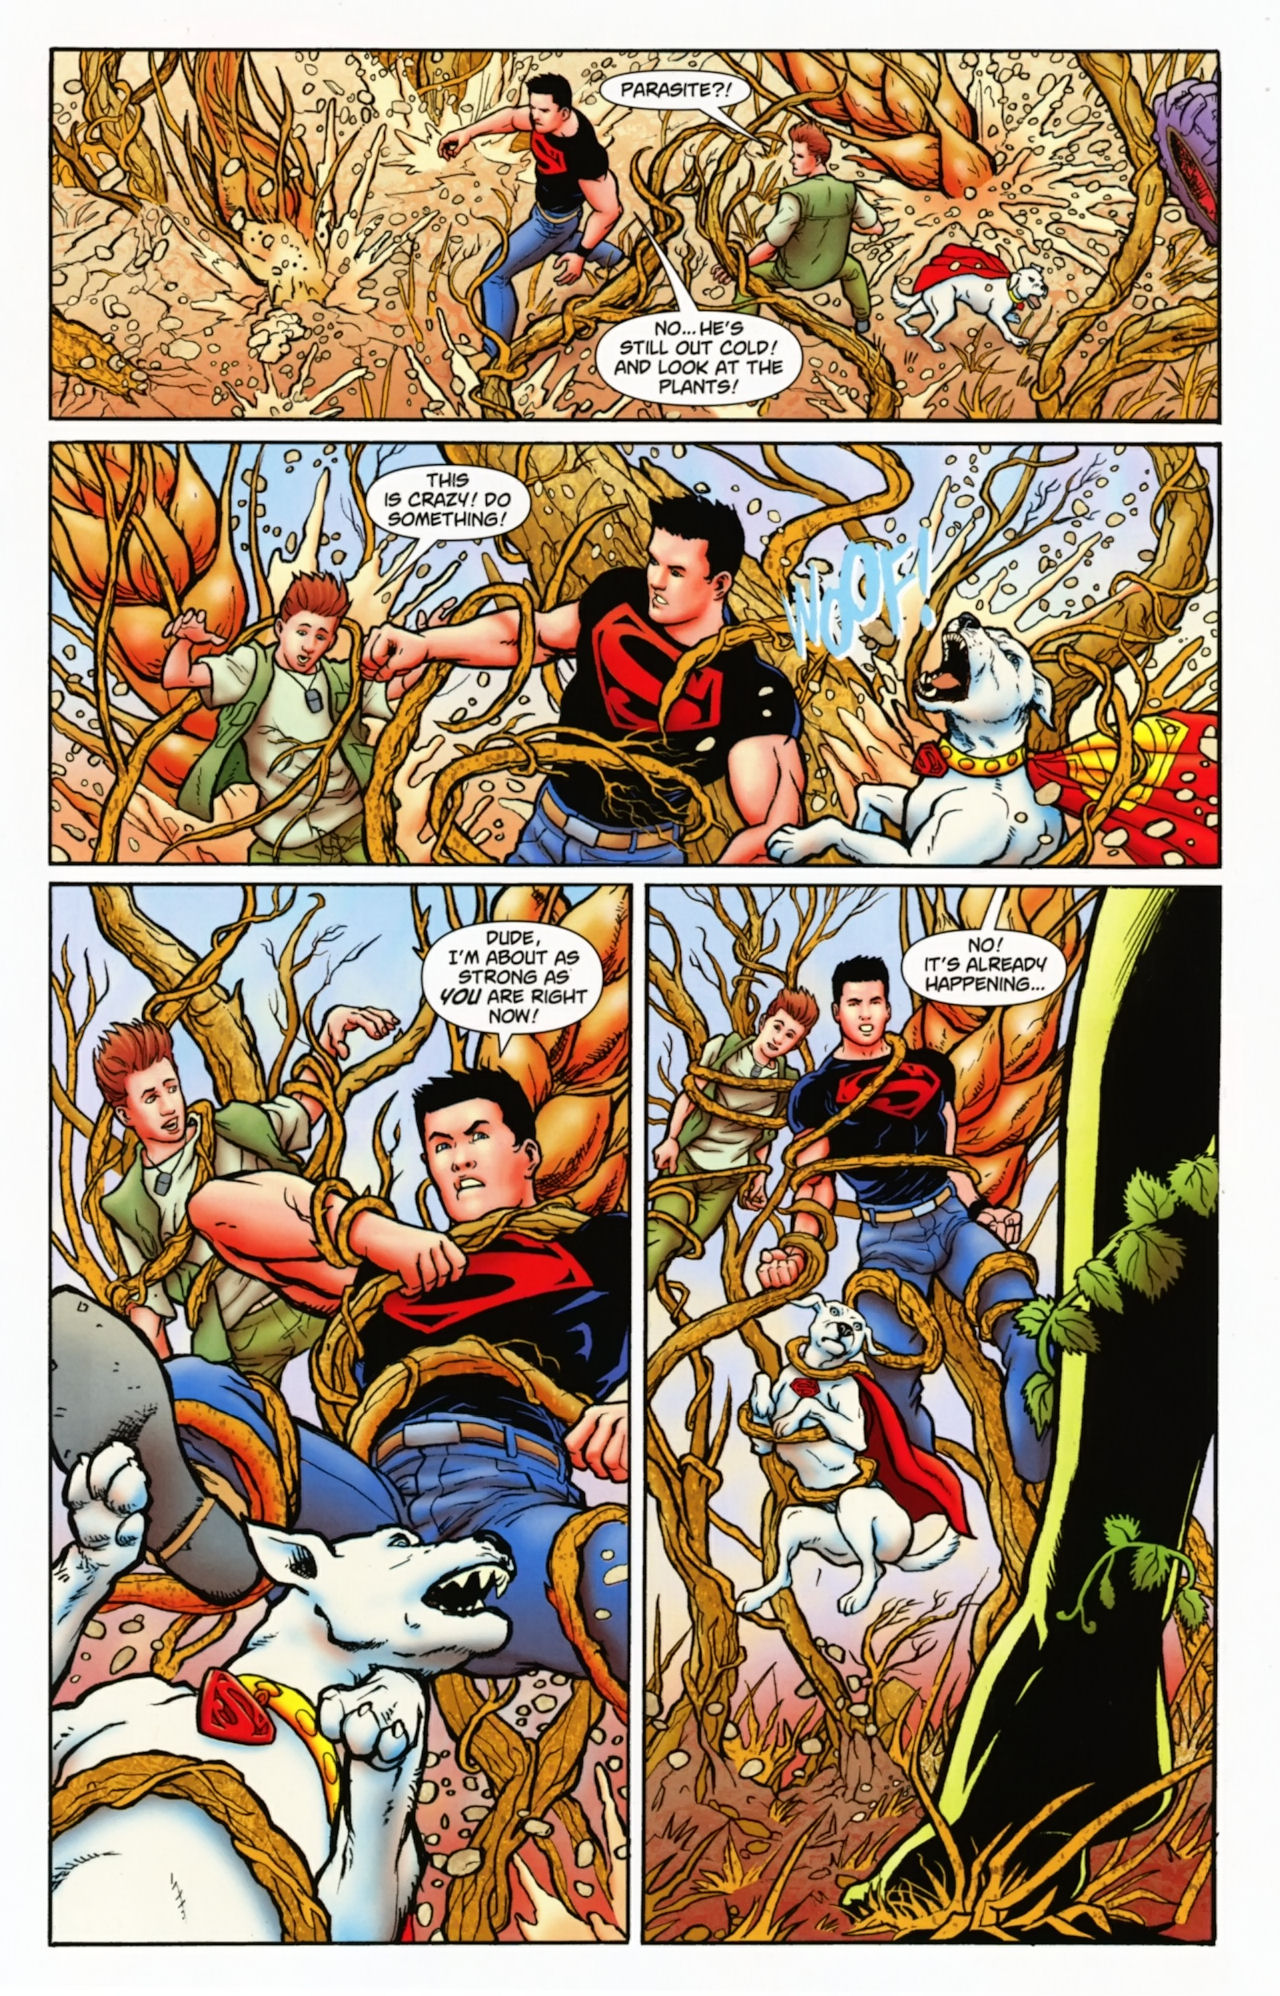 WTF DC Superboy WTF DC